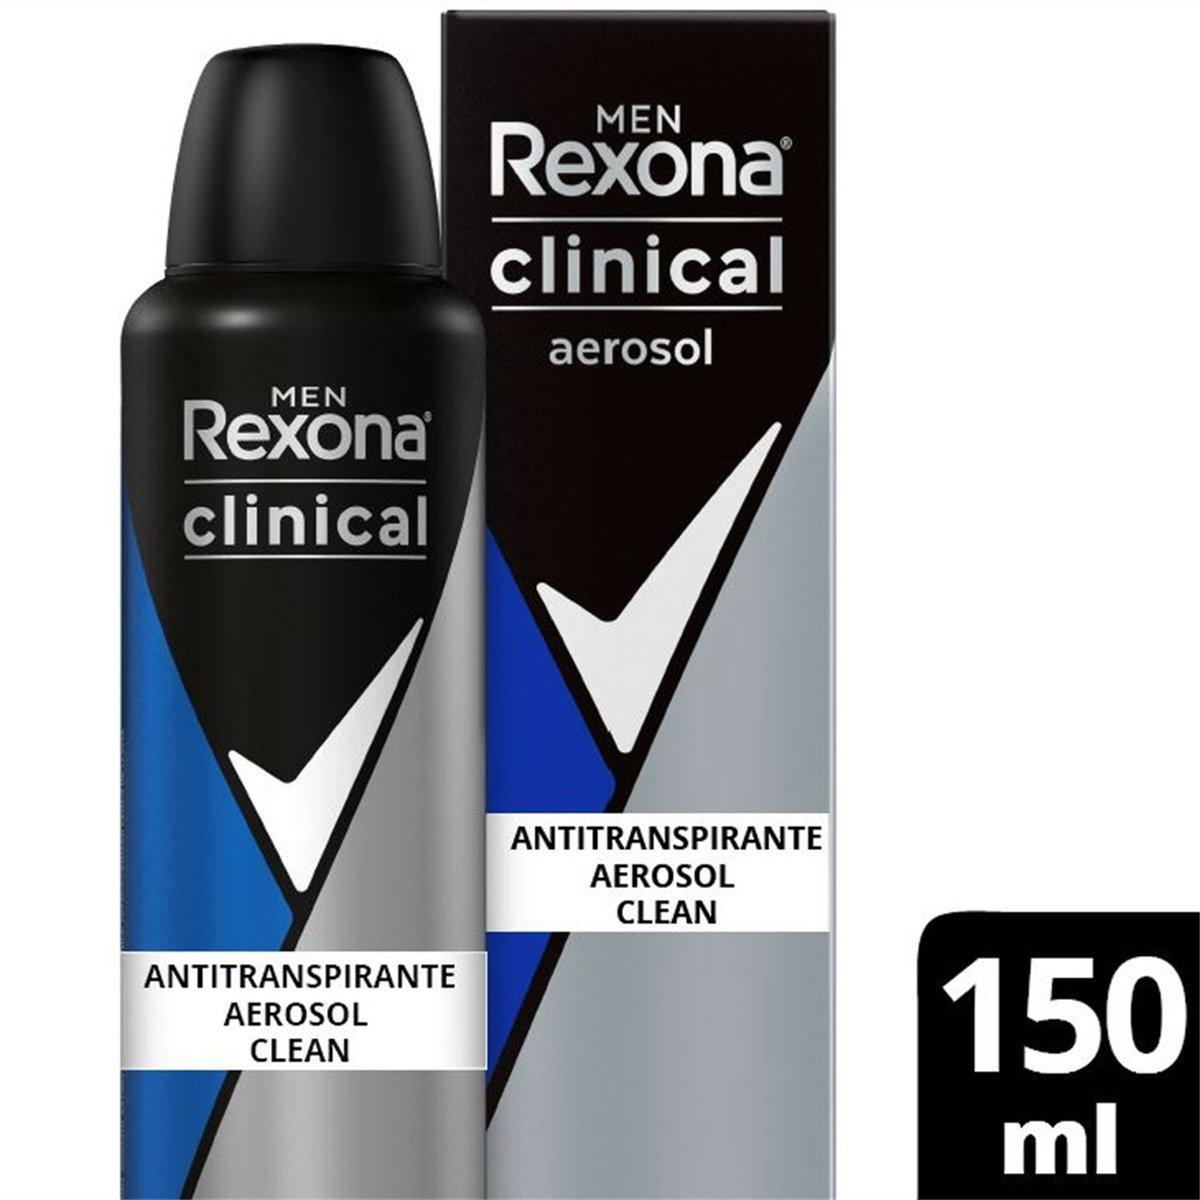 Desodorantes Antitranspirante Rexona Men Aerosol Clean Clinical 150ml